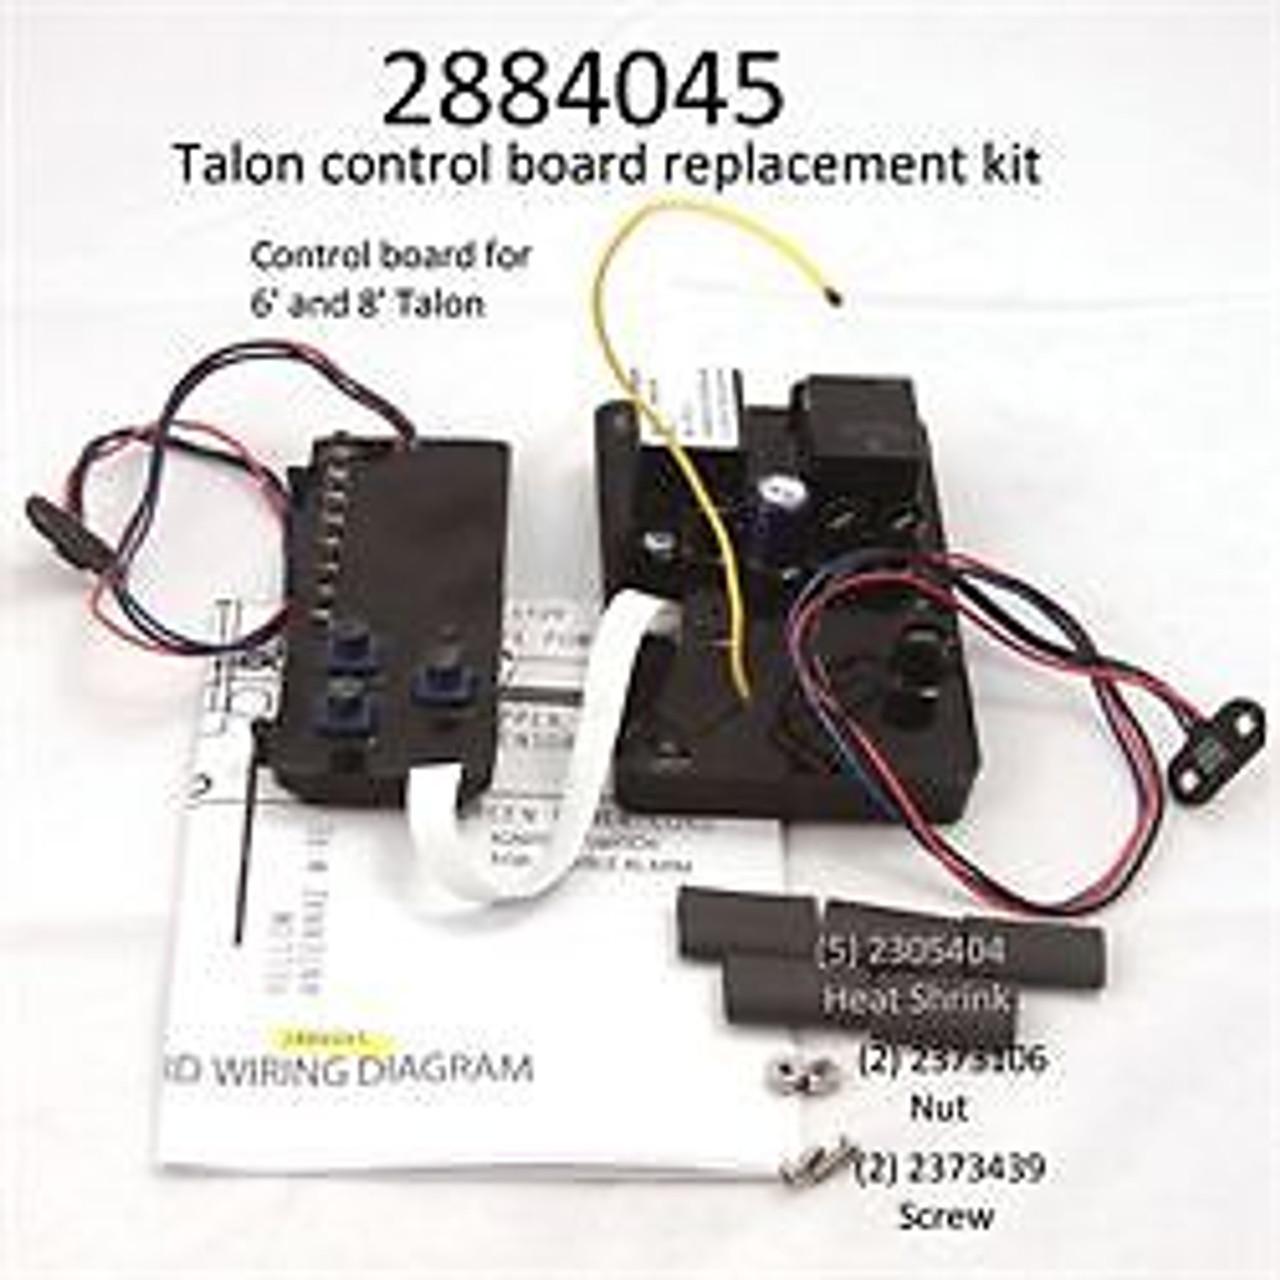 hight resolution of 2884045 61893 1485379734 jpg c 2 imbypass on